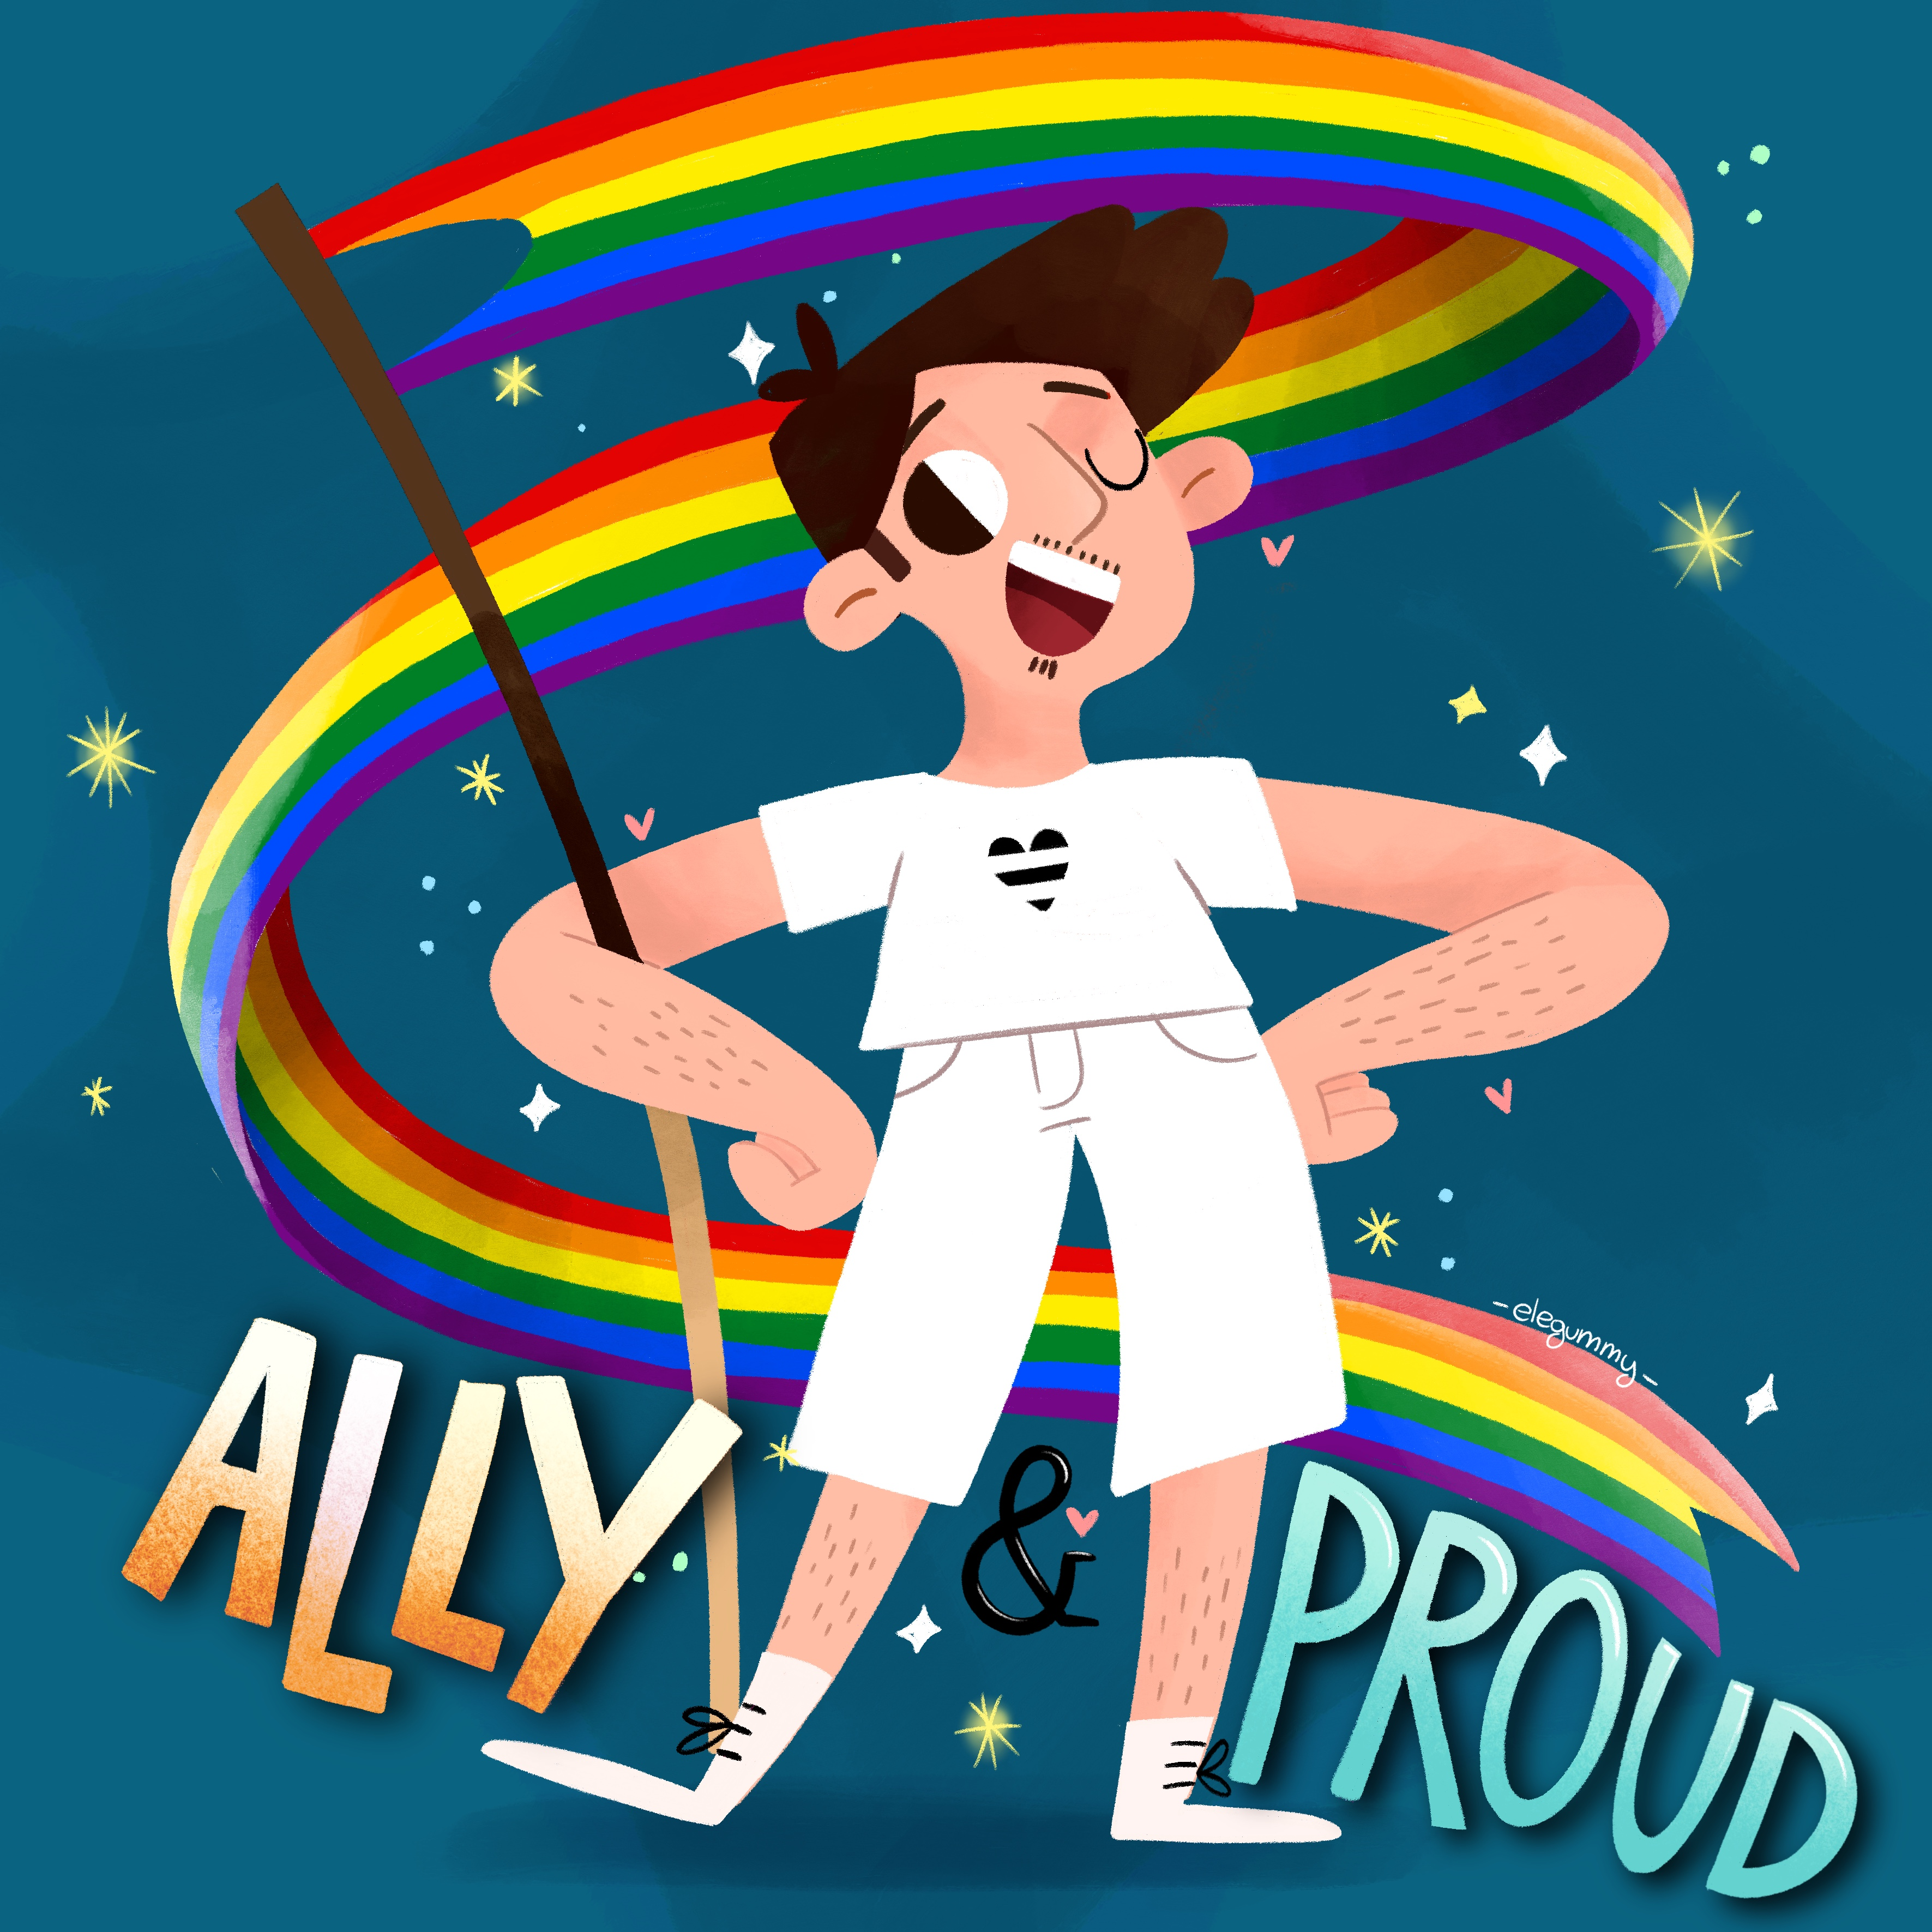 Ally 2